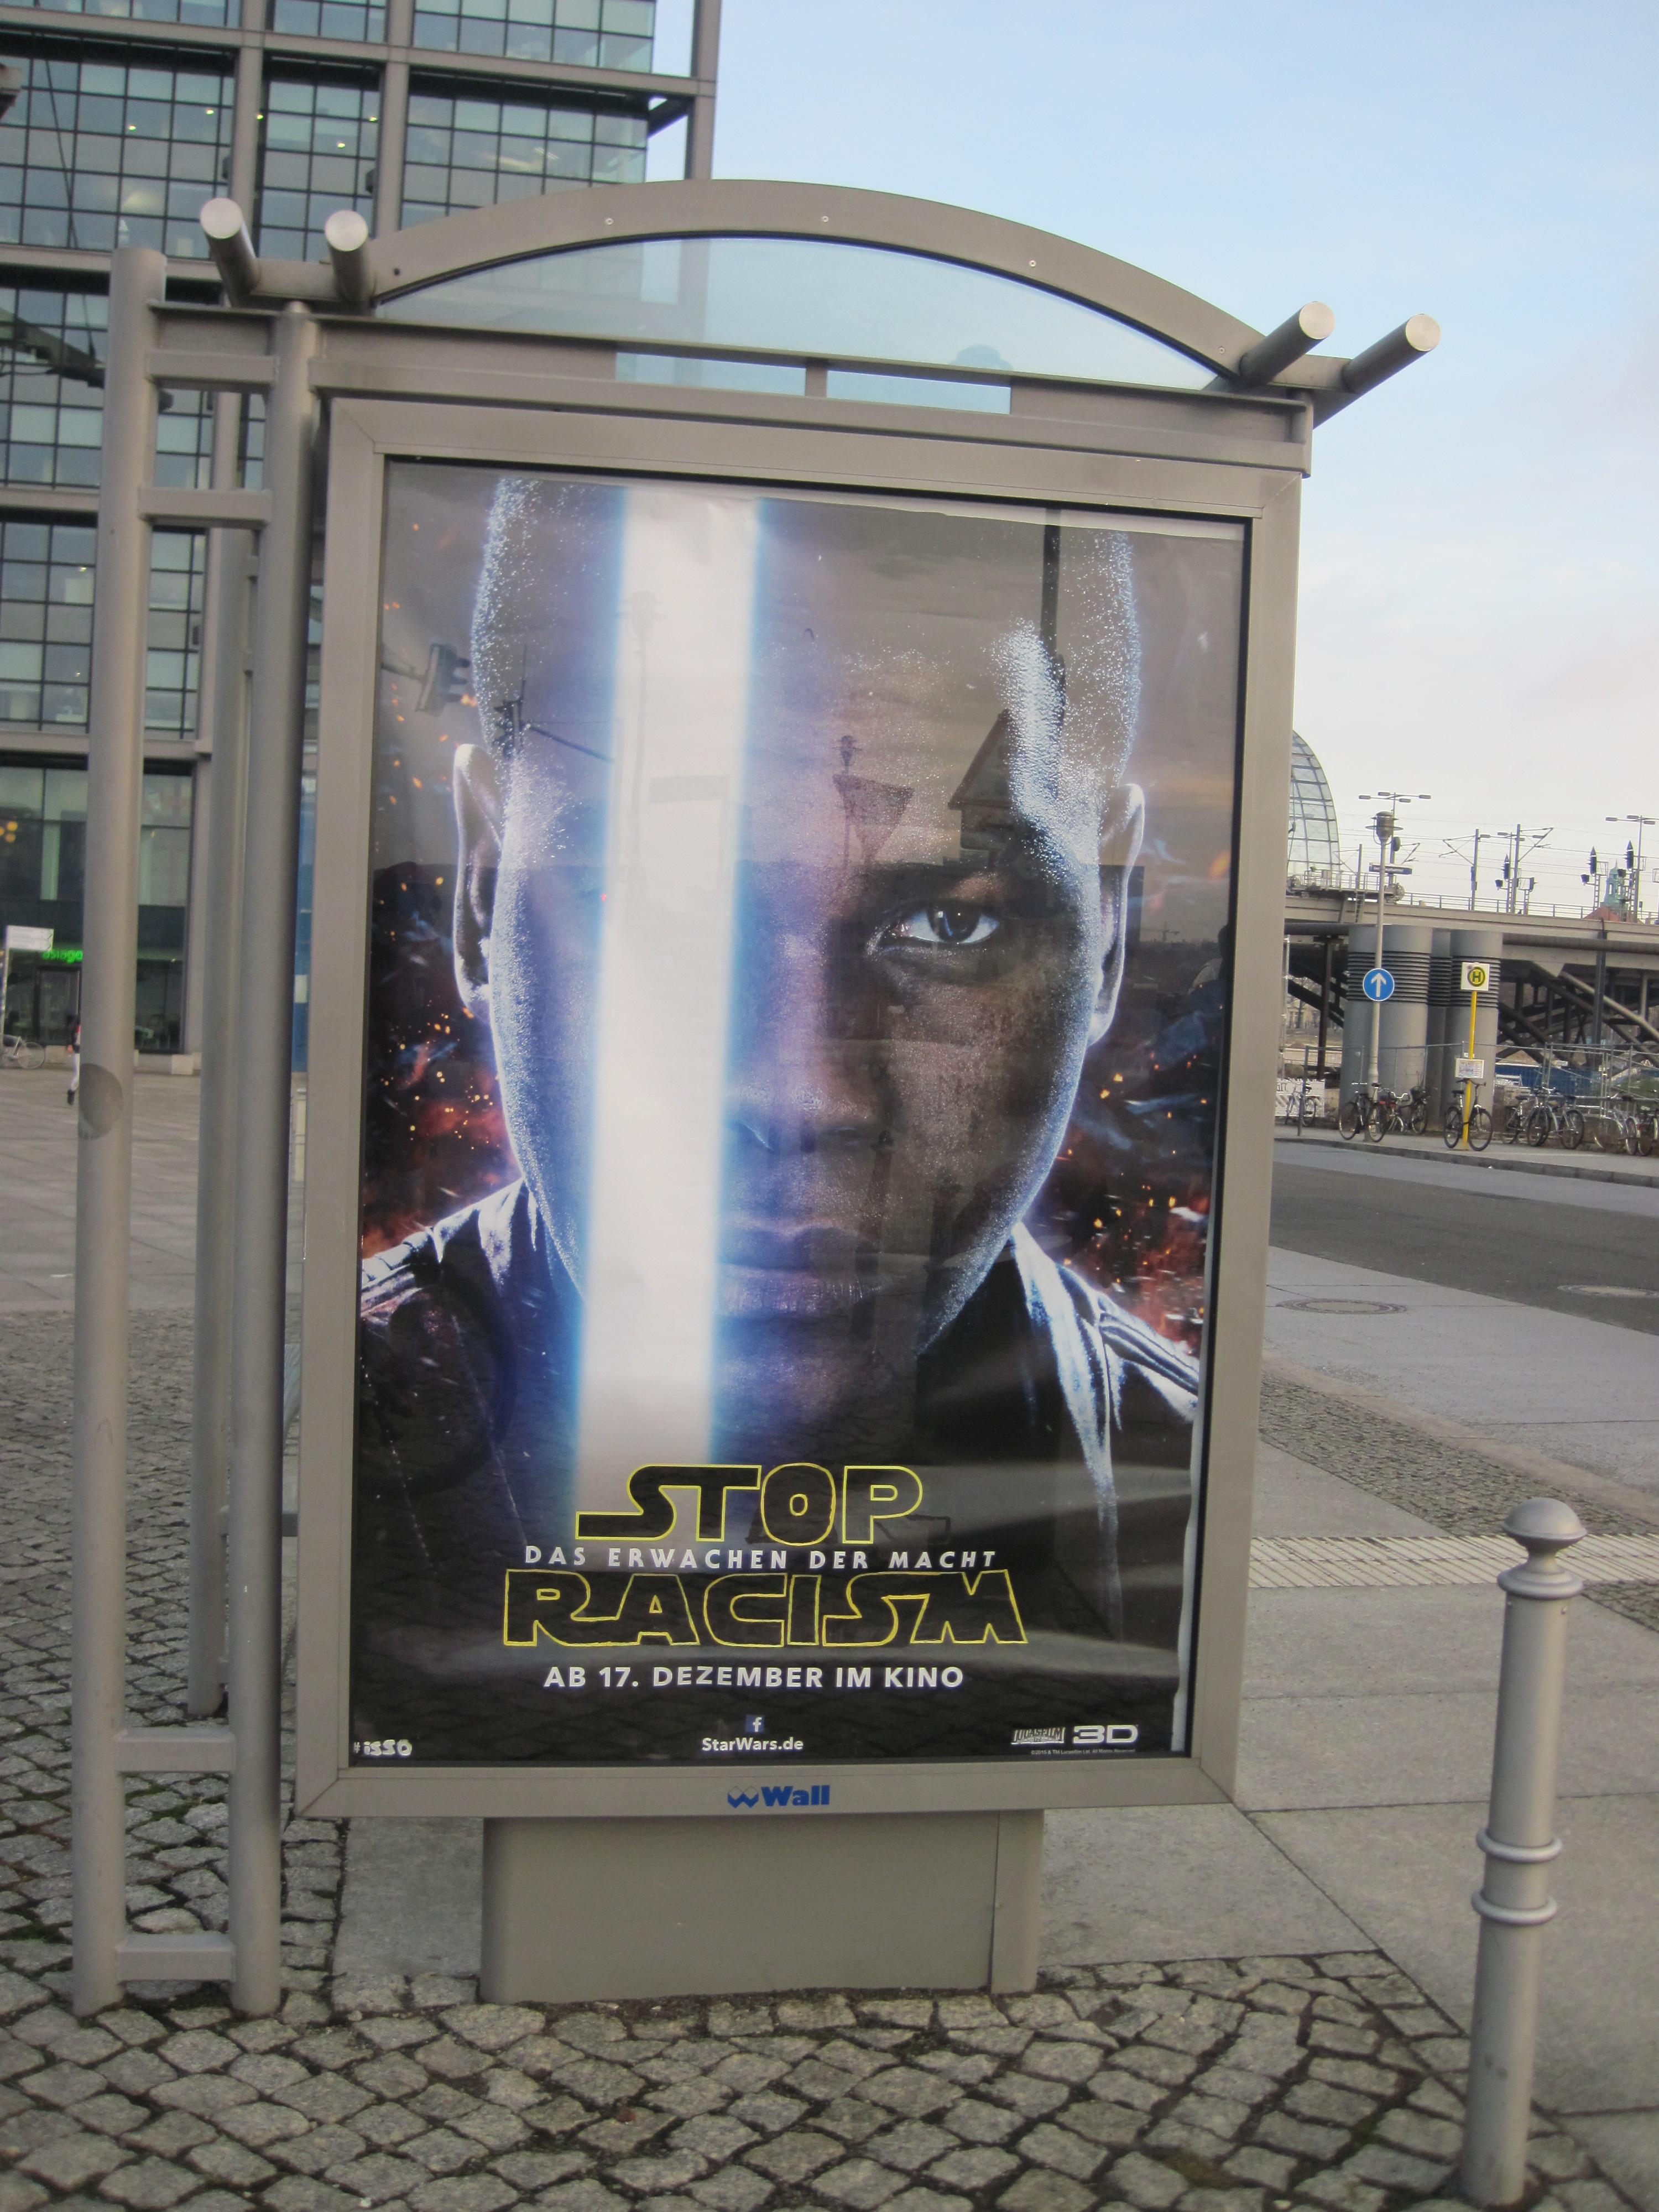 Stop Rascism-Adbusting statt Star Wars am Berliner HBF